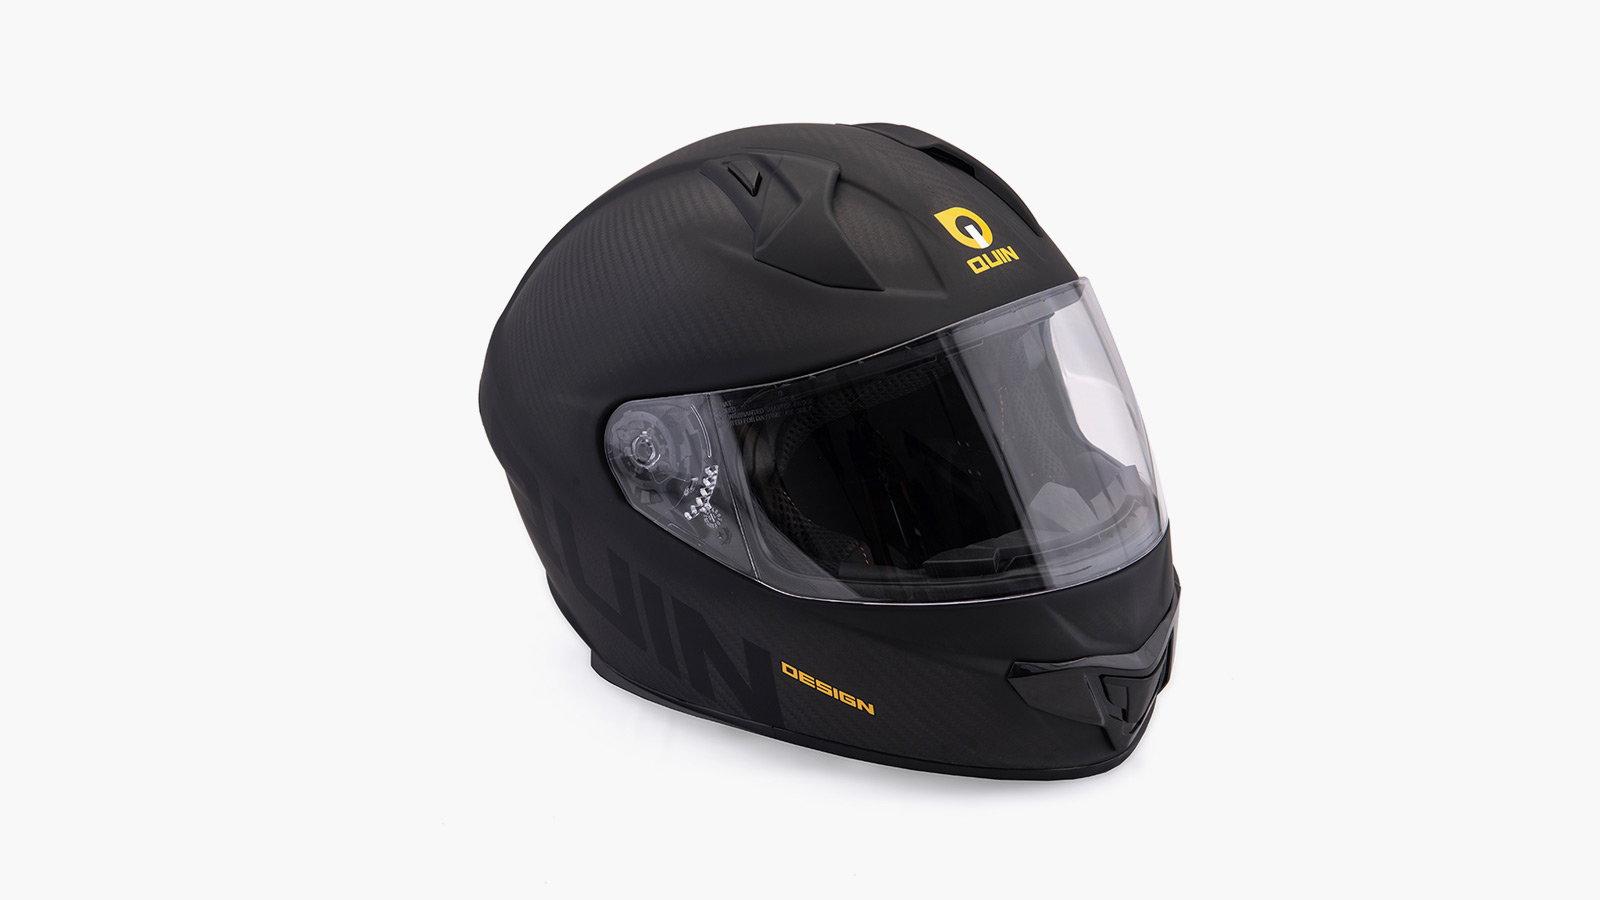 Quin Crafts a Smart Helmet For Improved Safety